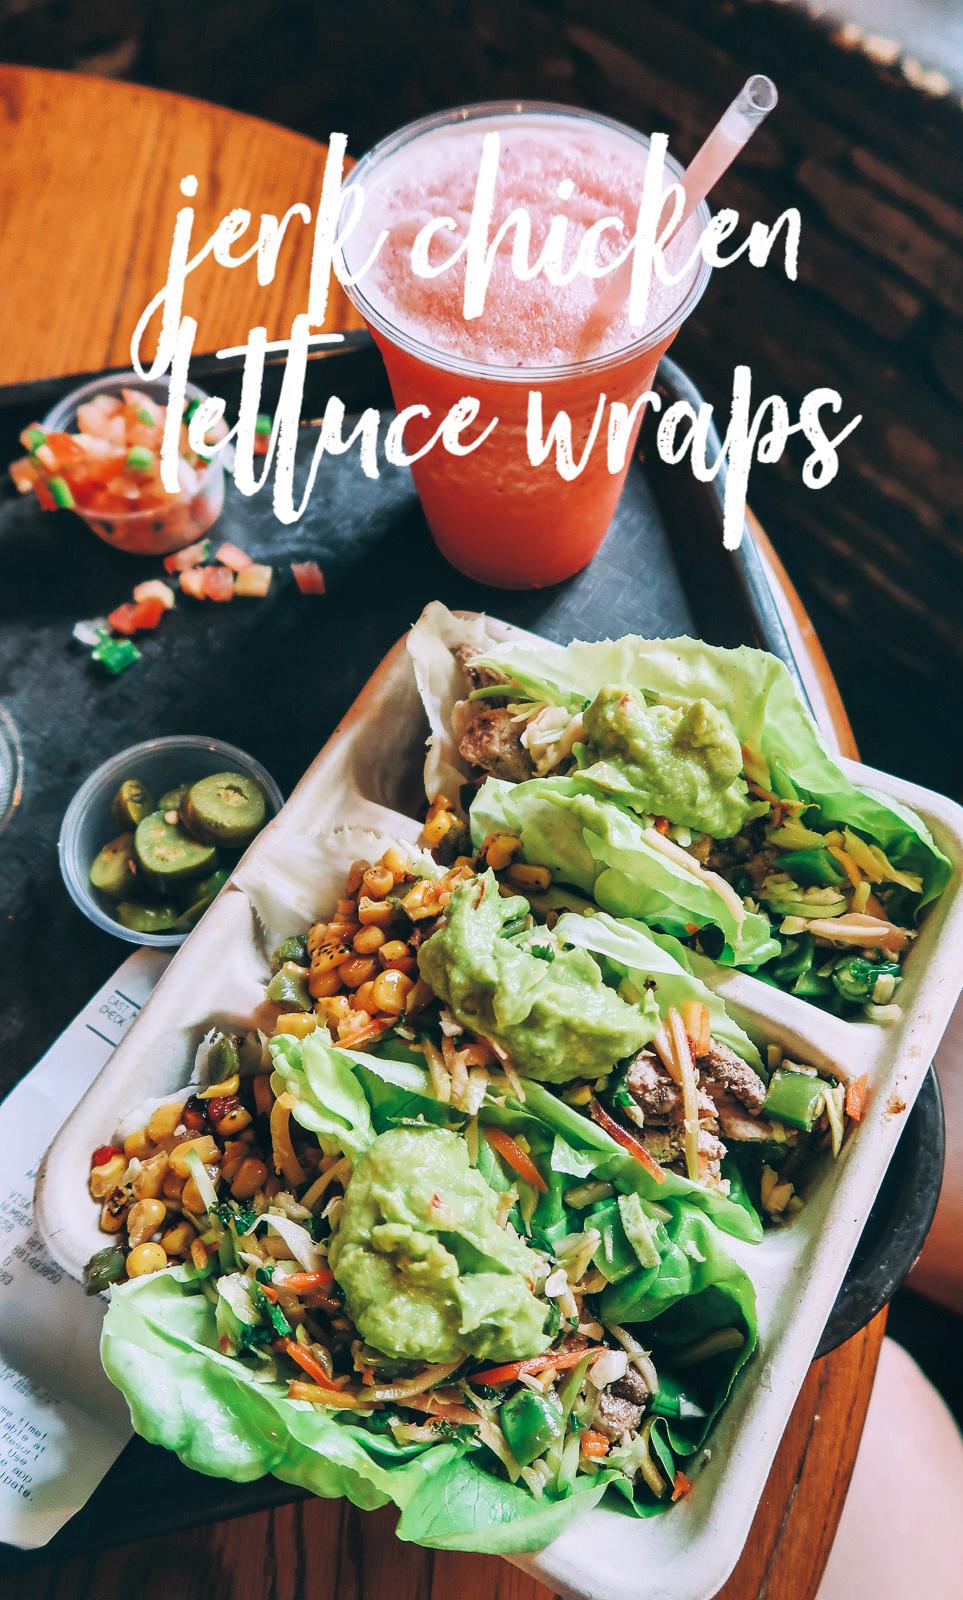 Tall Tale Inn And Cafe Pecos Bill Disney Magic Kingdom Food Jerk Chicken Lettuce Wraps Gluten Free